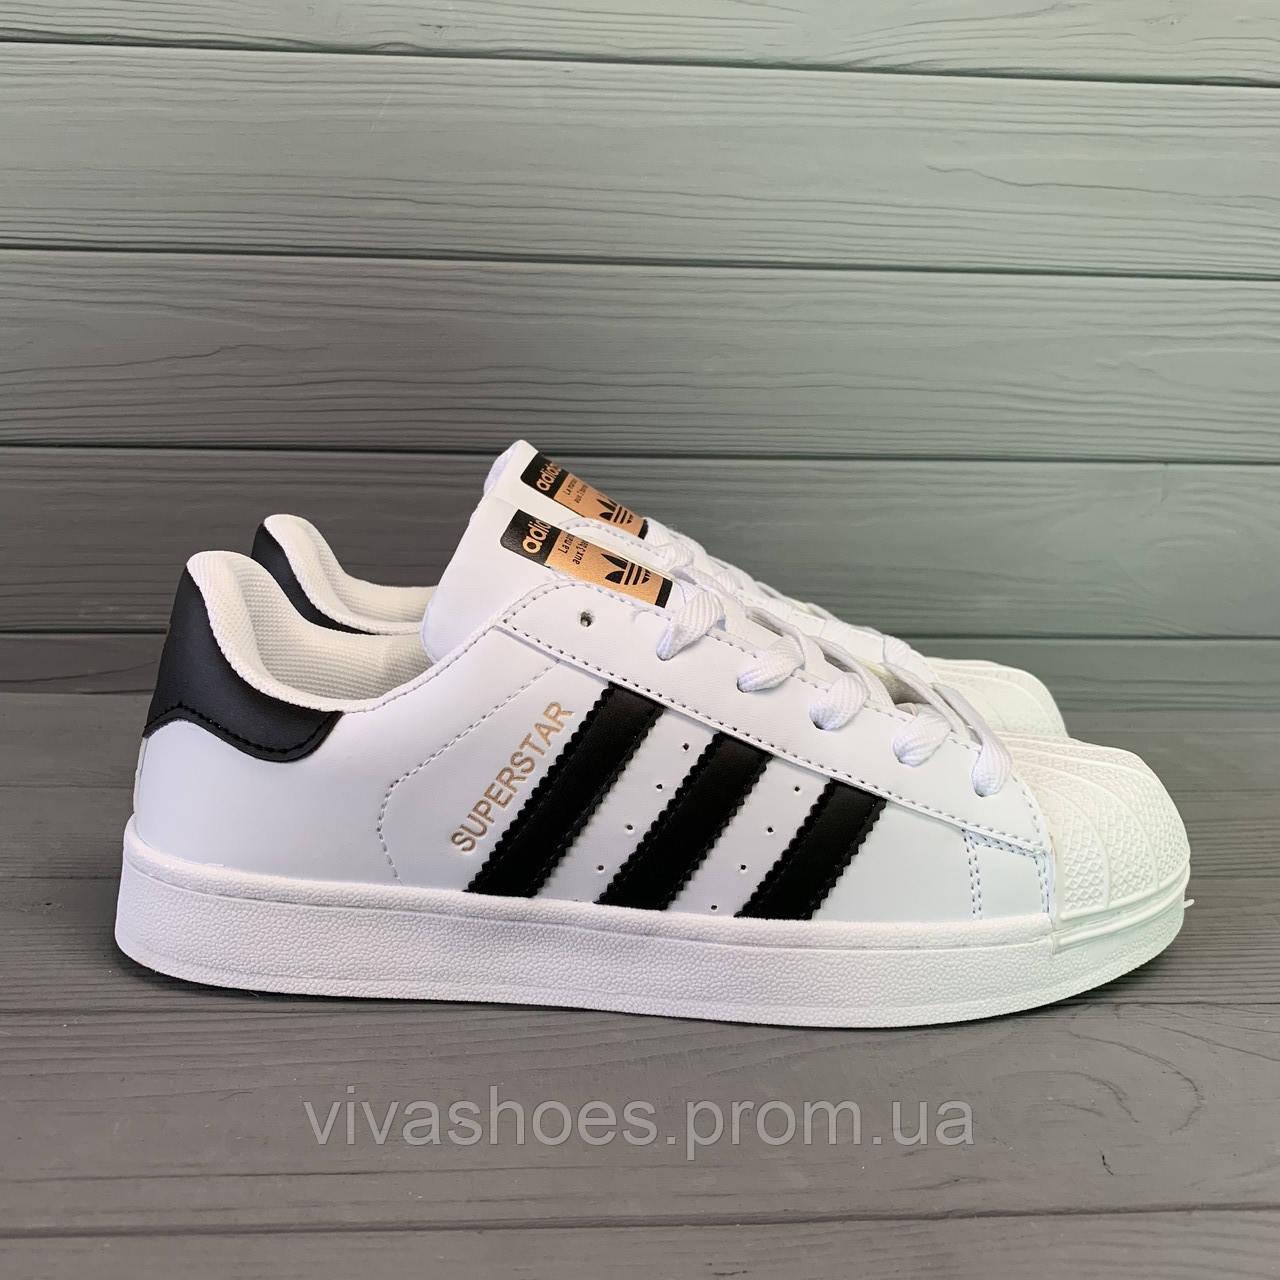 d3a879a2 Кроссовки мужские Adidas Superstar в стиле Адидас Суперстар, натуральная  кожа, текстиль код RD-